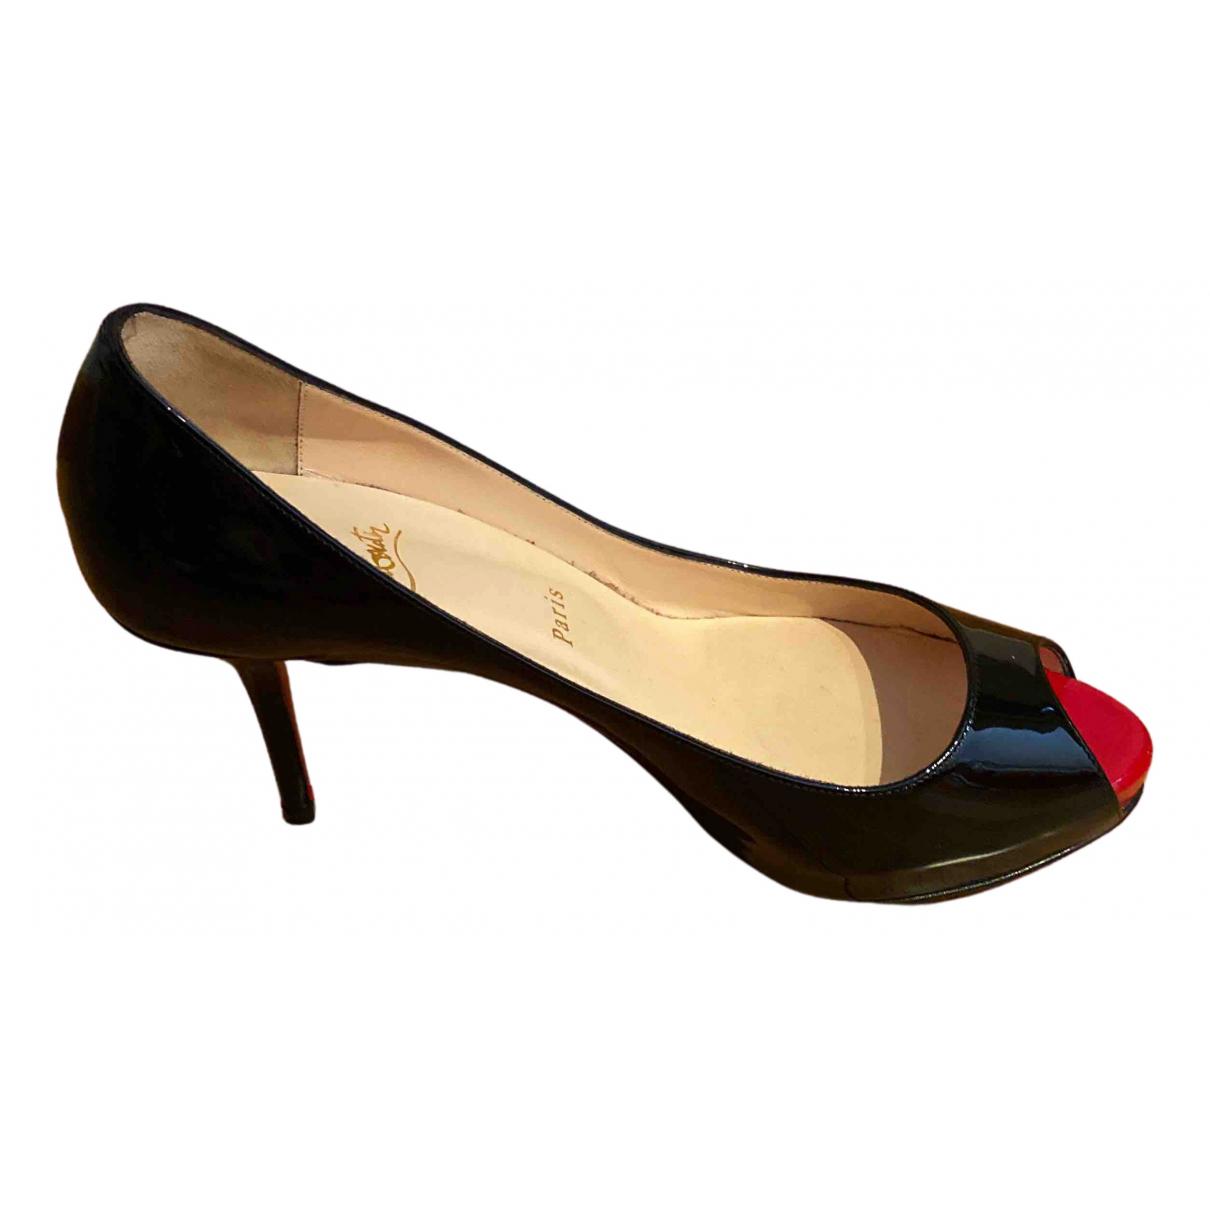 Christian Louboutin Very Privé Black Patent leather Heels for Women 39.5 EU